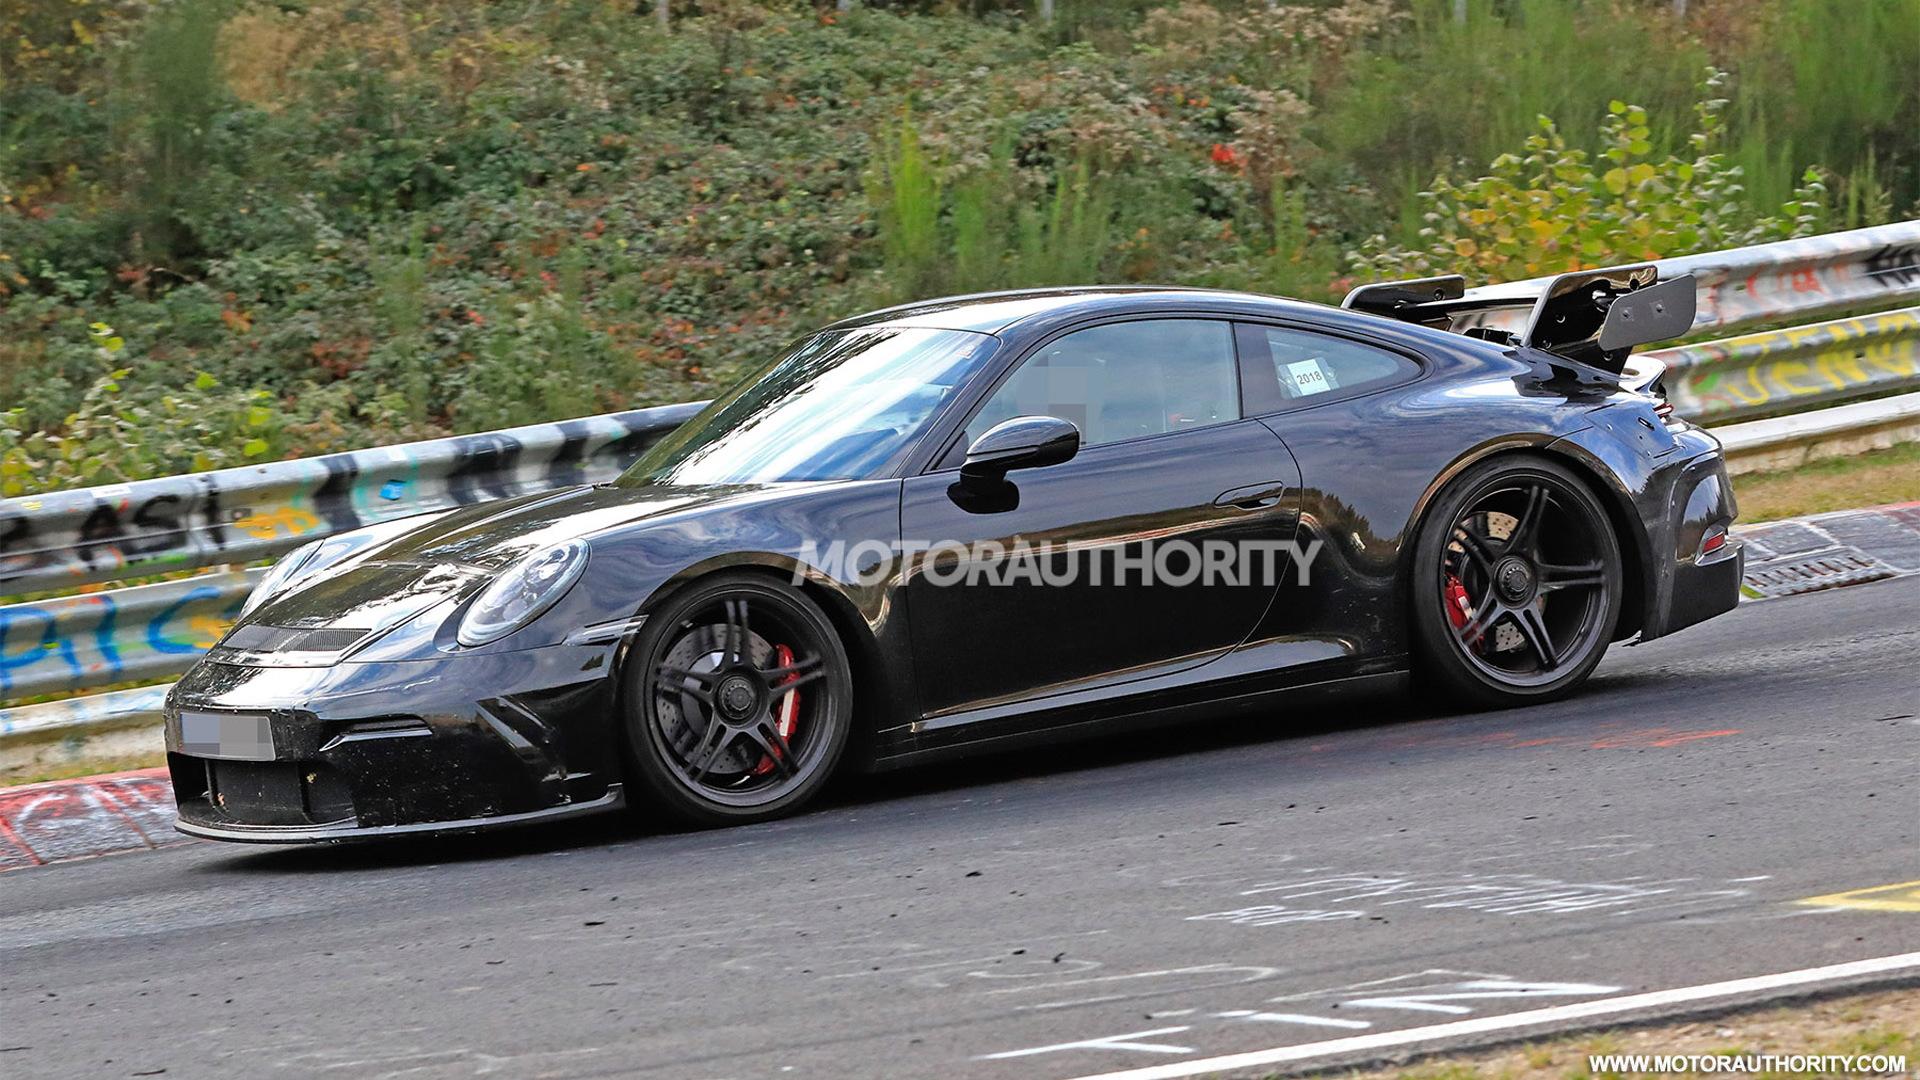 2021 Porsche 911 GT3 spy shots - Image via S. Baldauf/SB-Medien